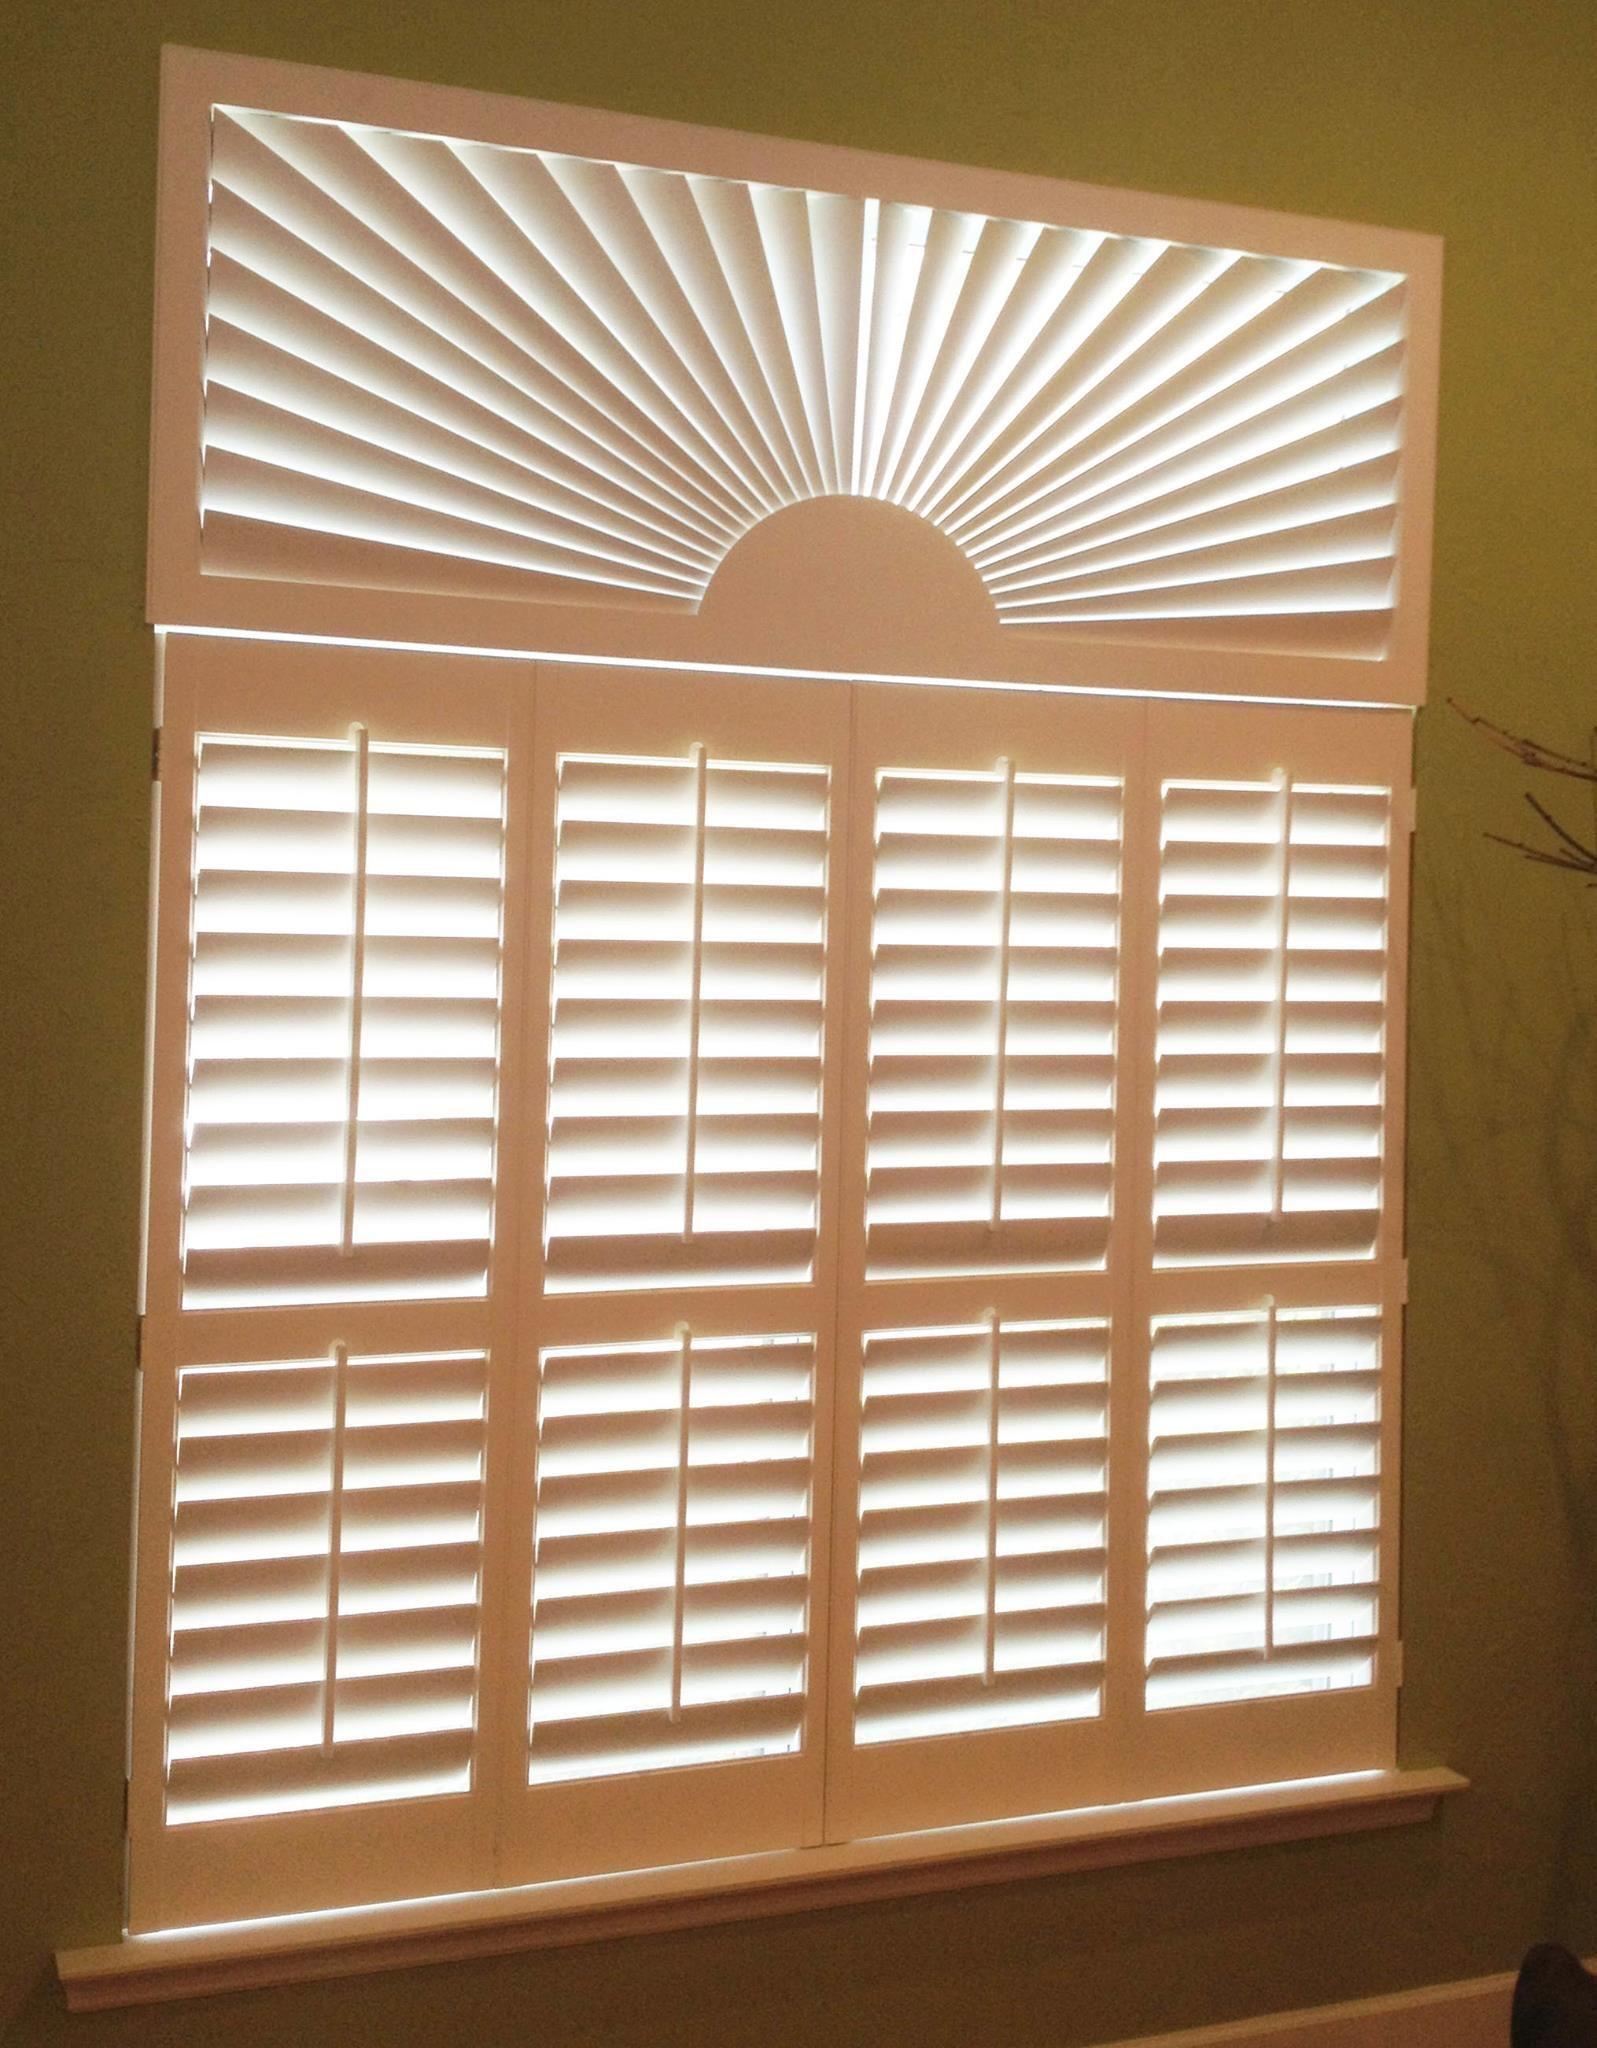 3 window bedroom ideas   wonderful diy ideas sheer blinds drapery panels grey blinds